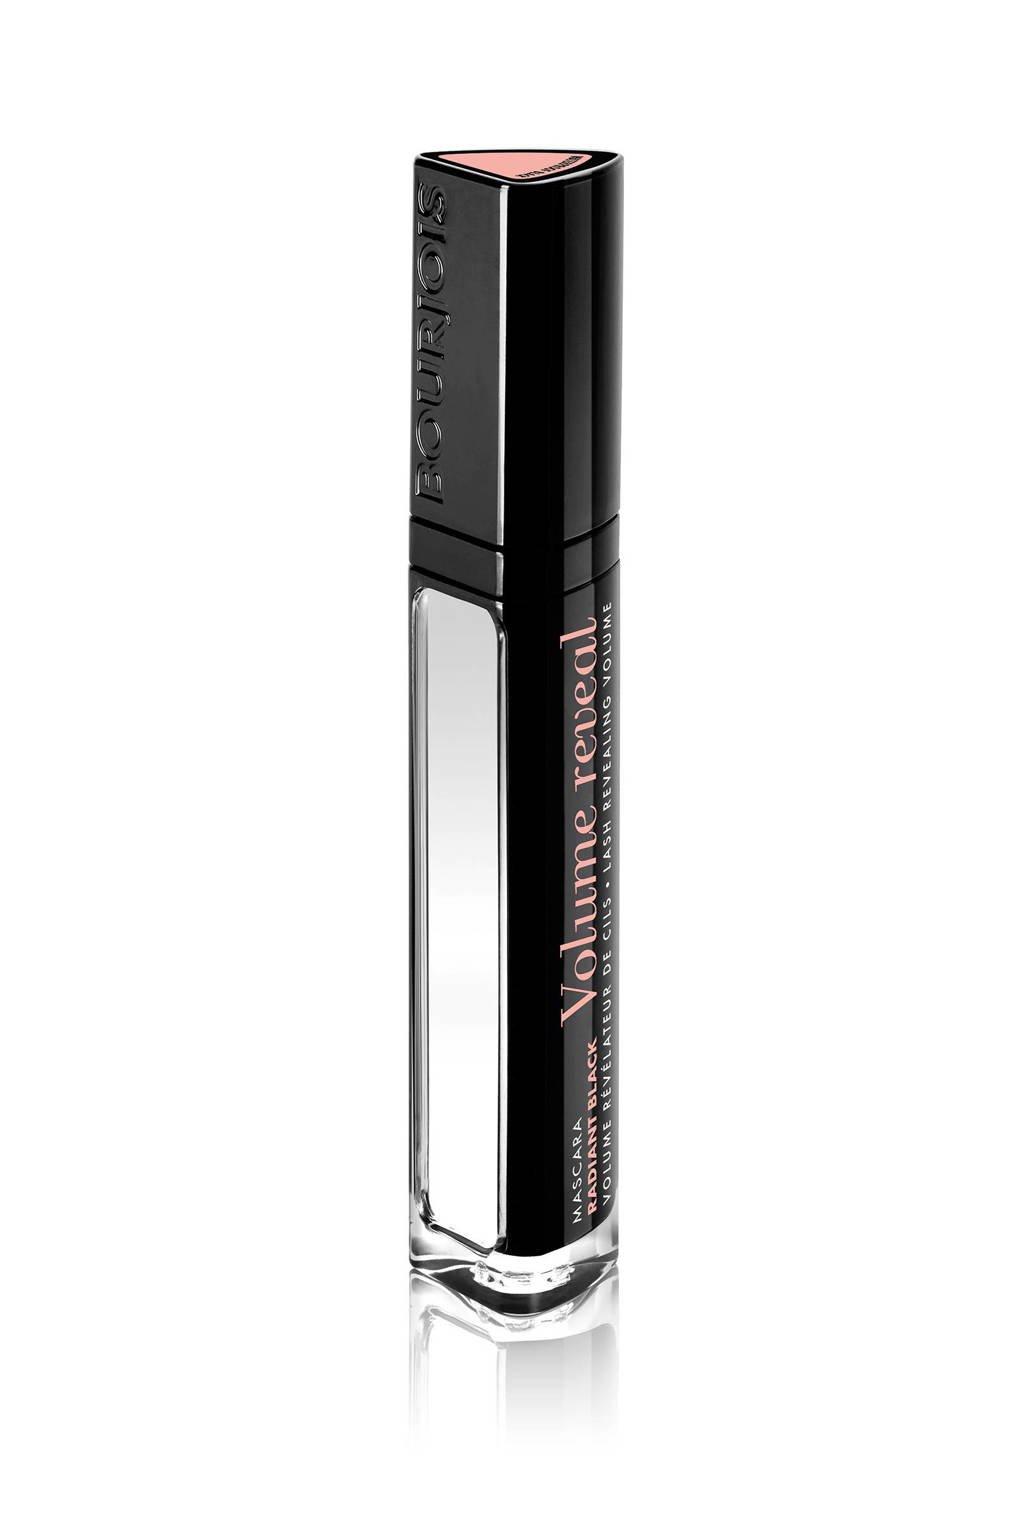 Bourjois Volume Reveal mascara - 21 Black